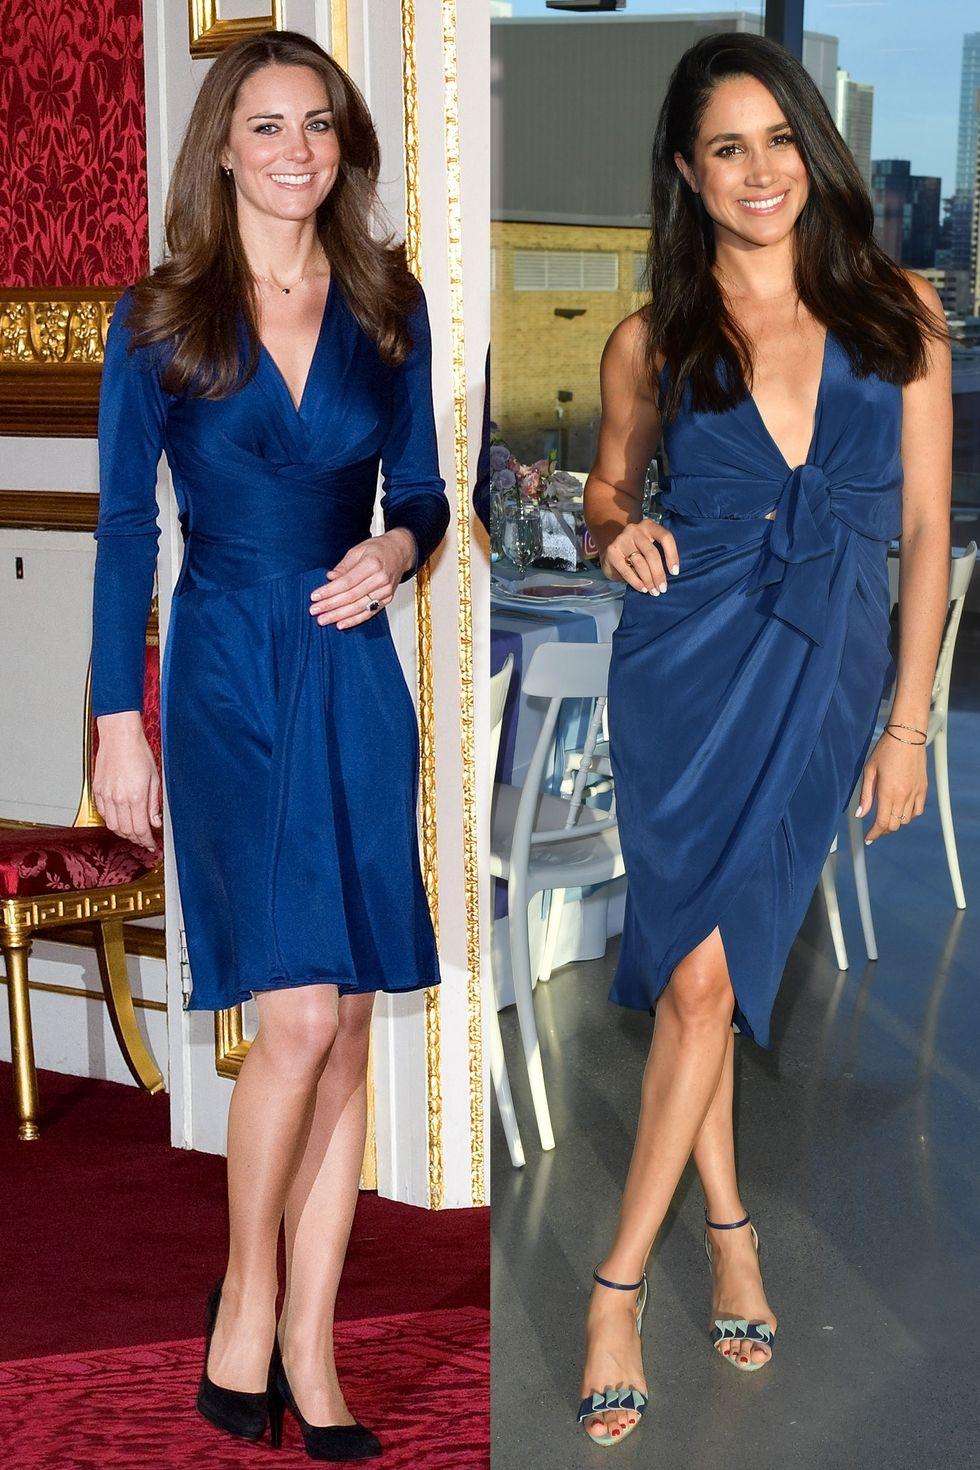 Vestido azul princesa kate